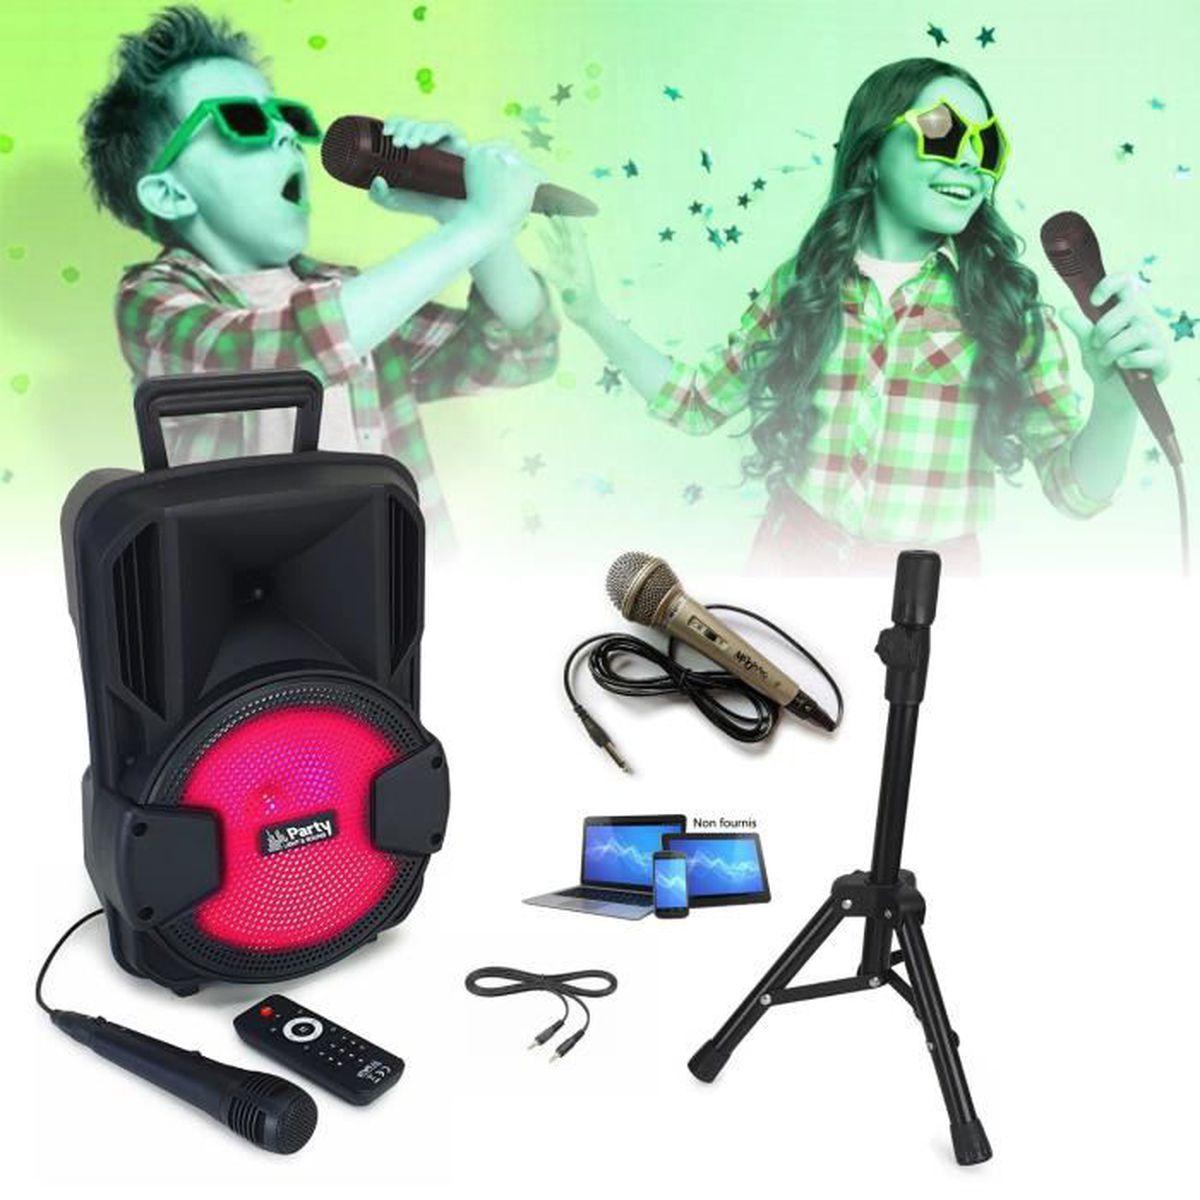 MICRO - KARAOKÉ 2 MICROS + ENCEINTE KARAOKE SONO + USB MP3 BLUETOO